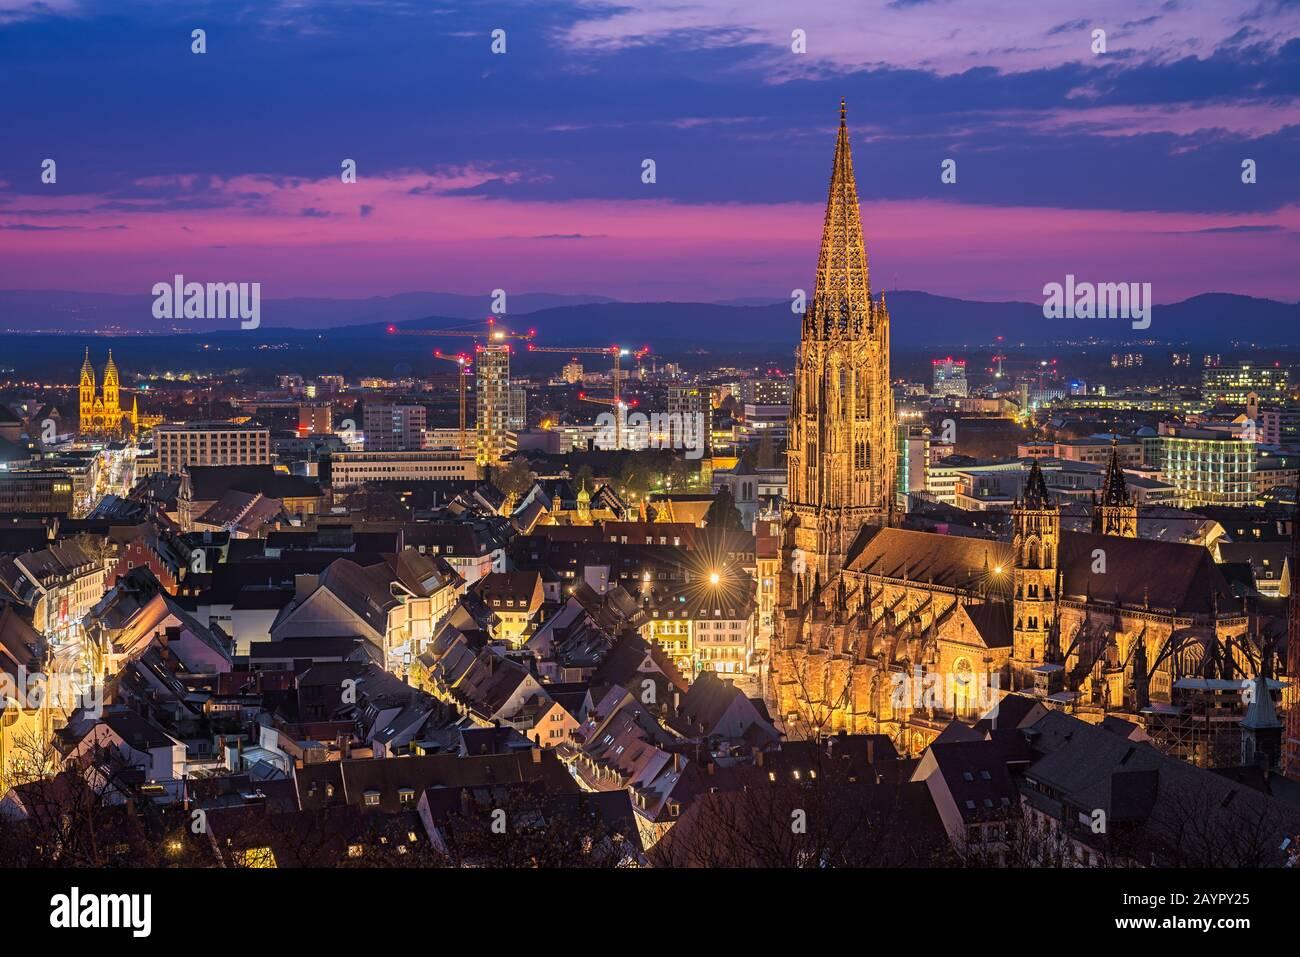 Night skyline of Freiburg im Breisgau, Germany Stock Photo